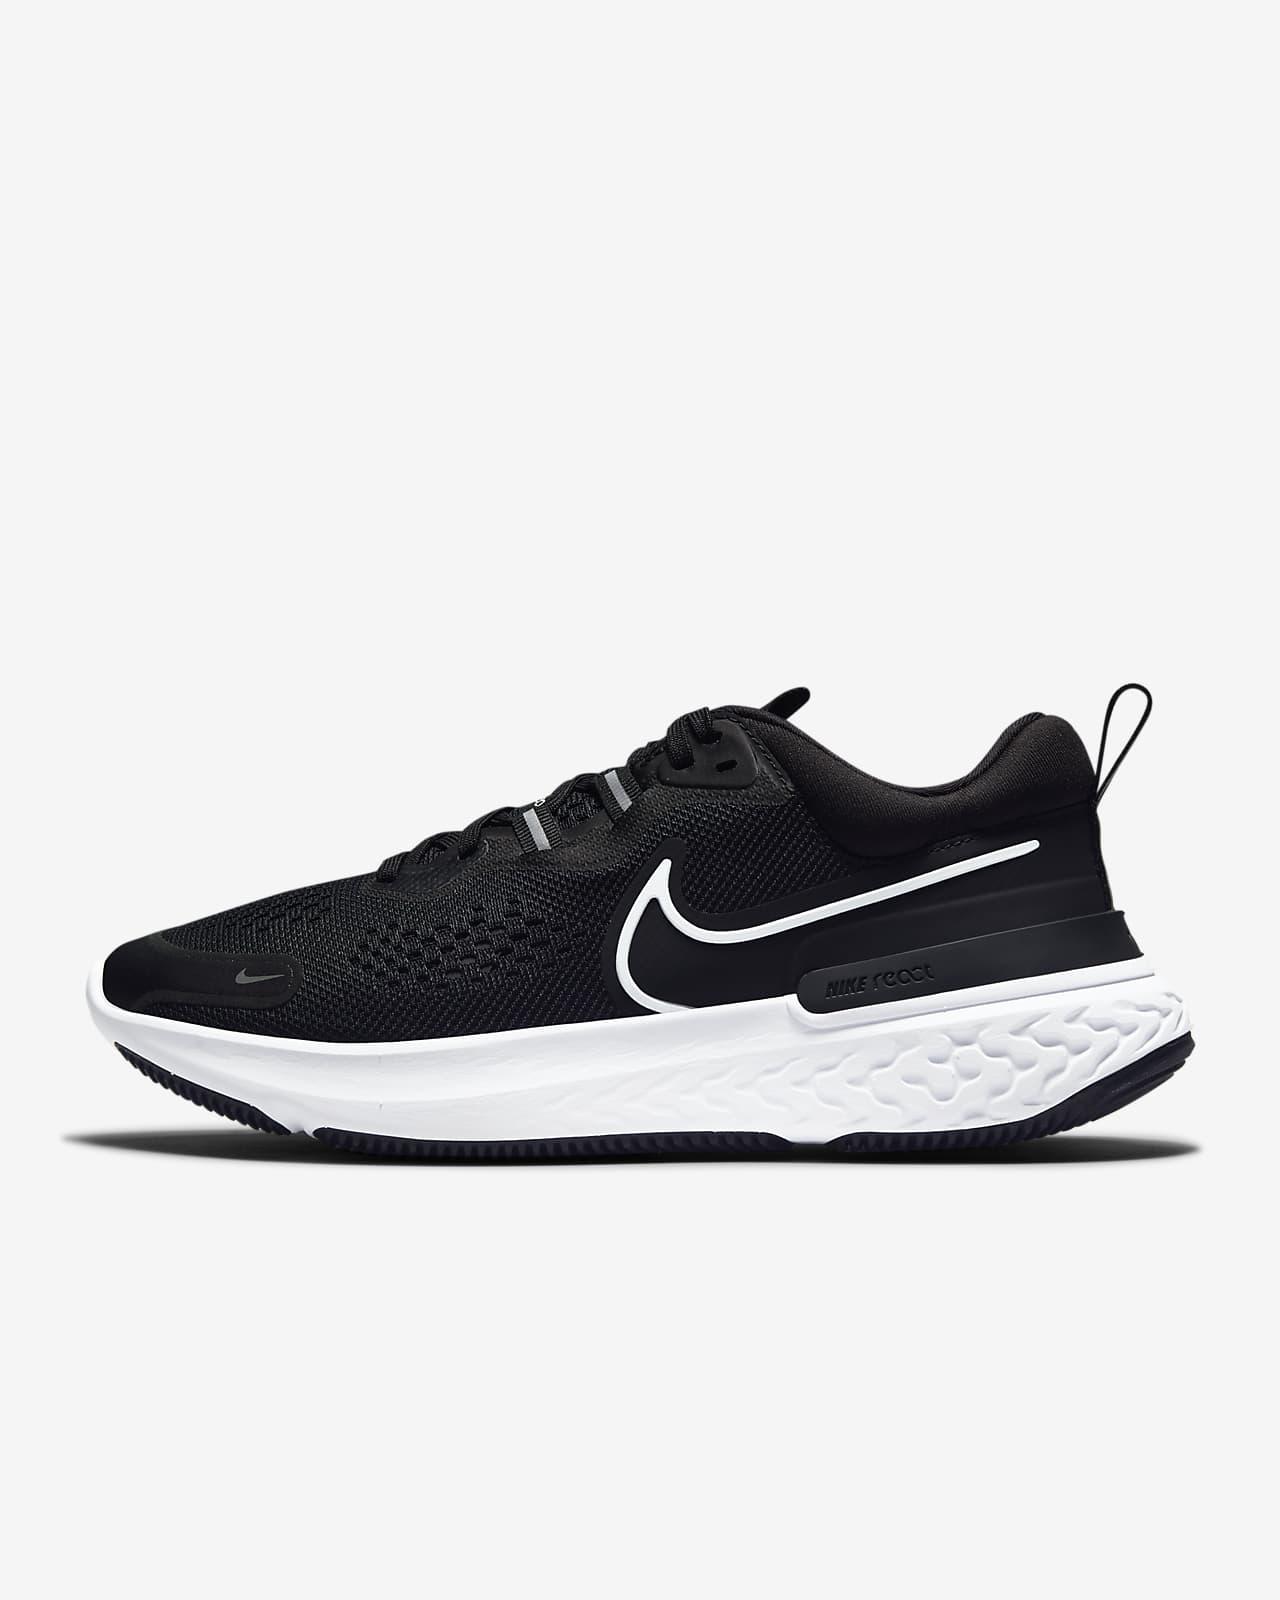 Nike React Miler 2 Women's Running Shoe